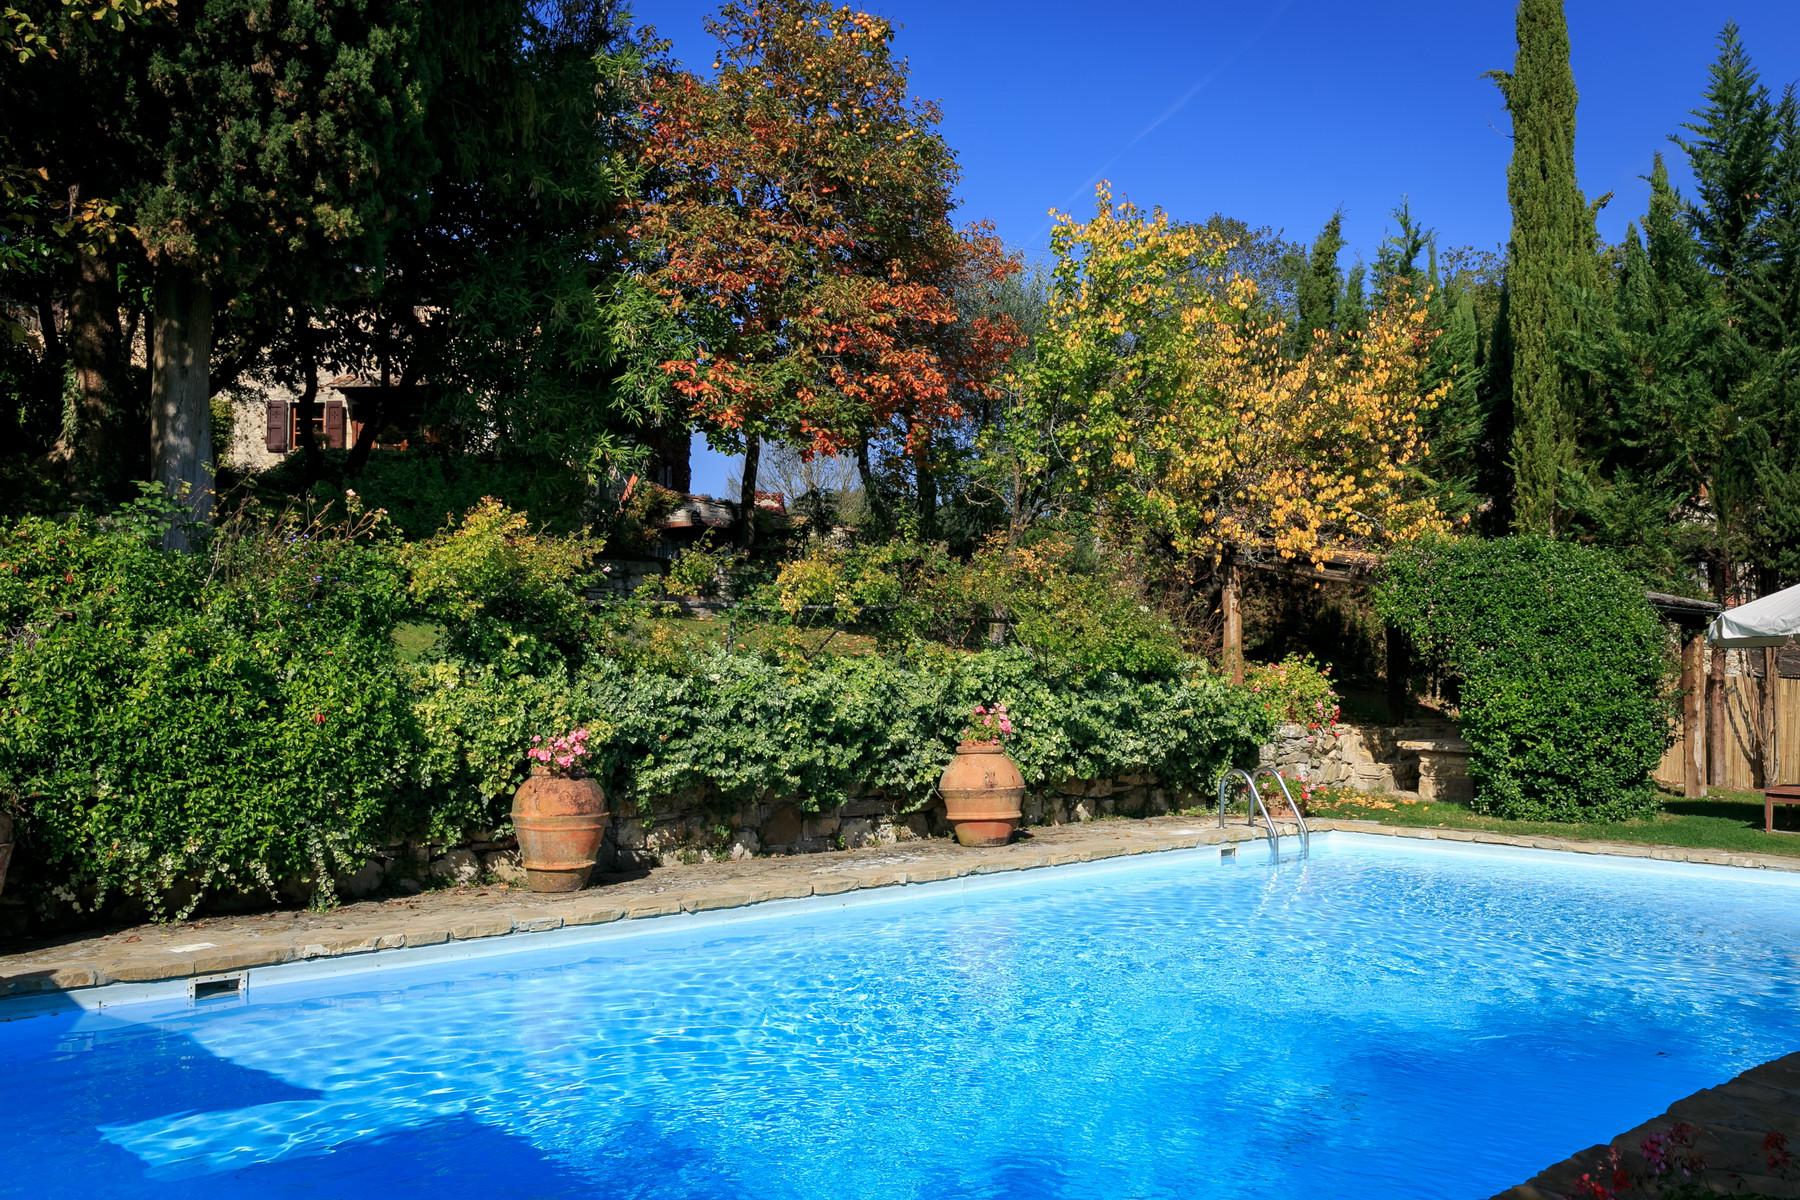 Rustico in Vendita a Castellina In Chianti: 5 locali, 720 mq - Foto 16